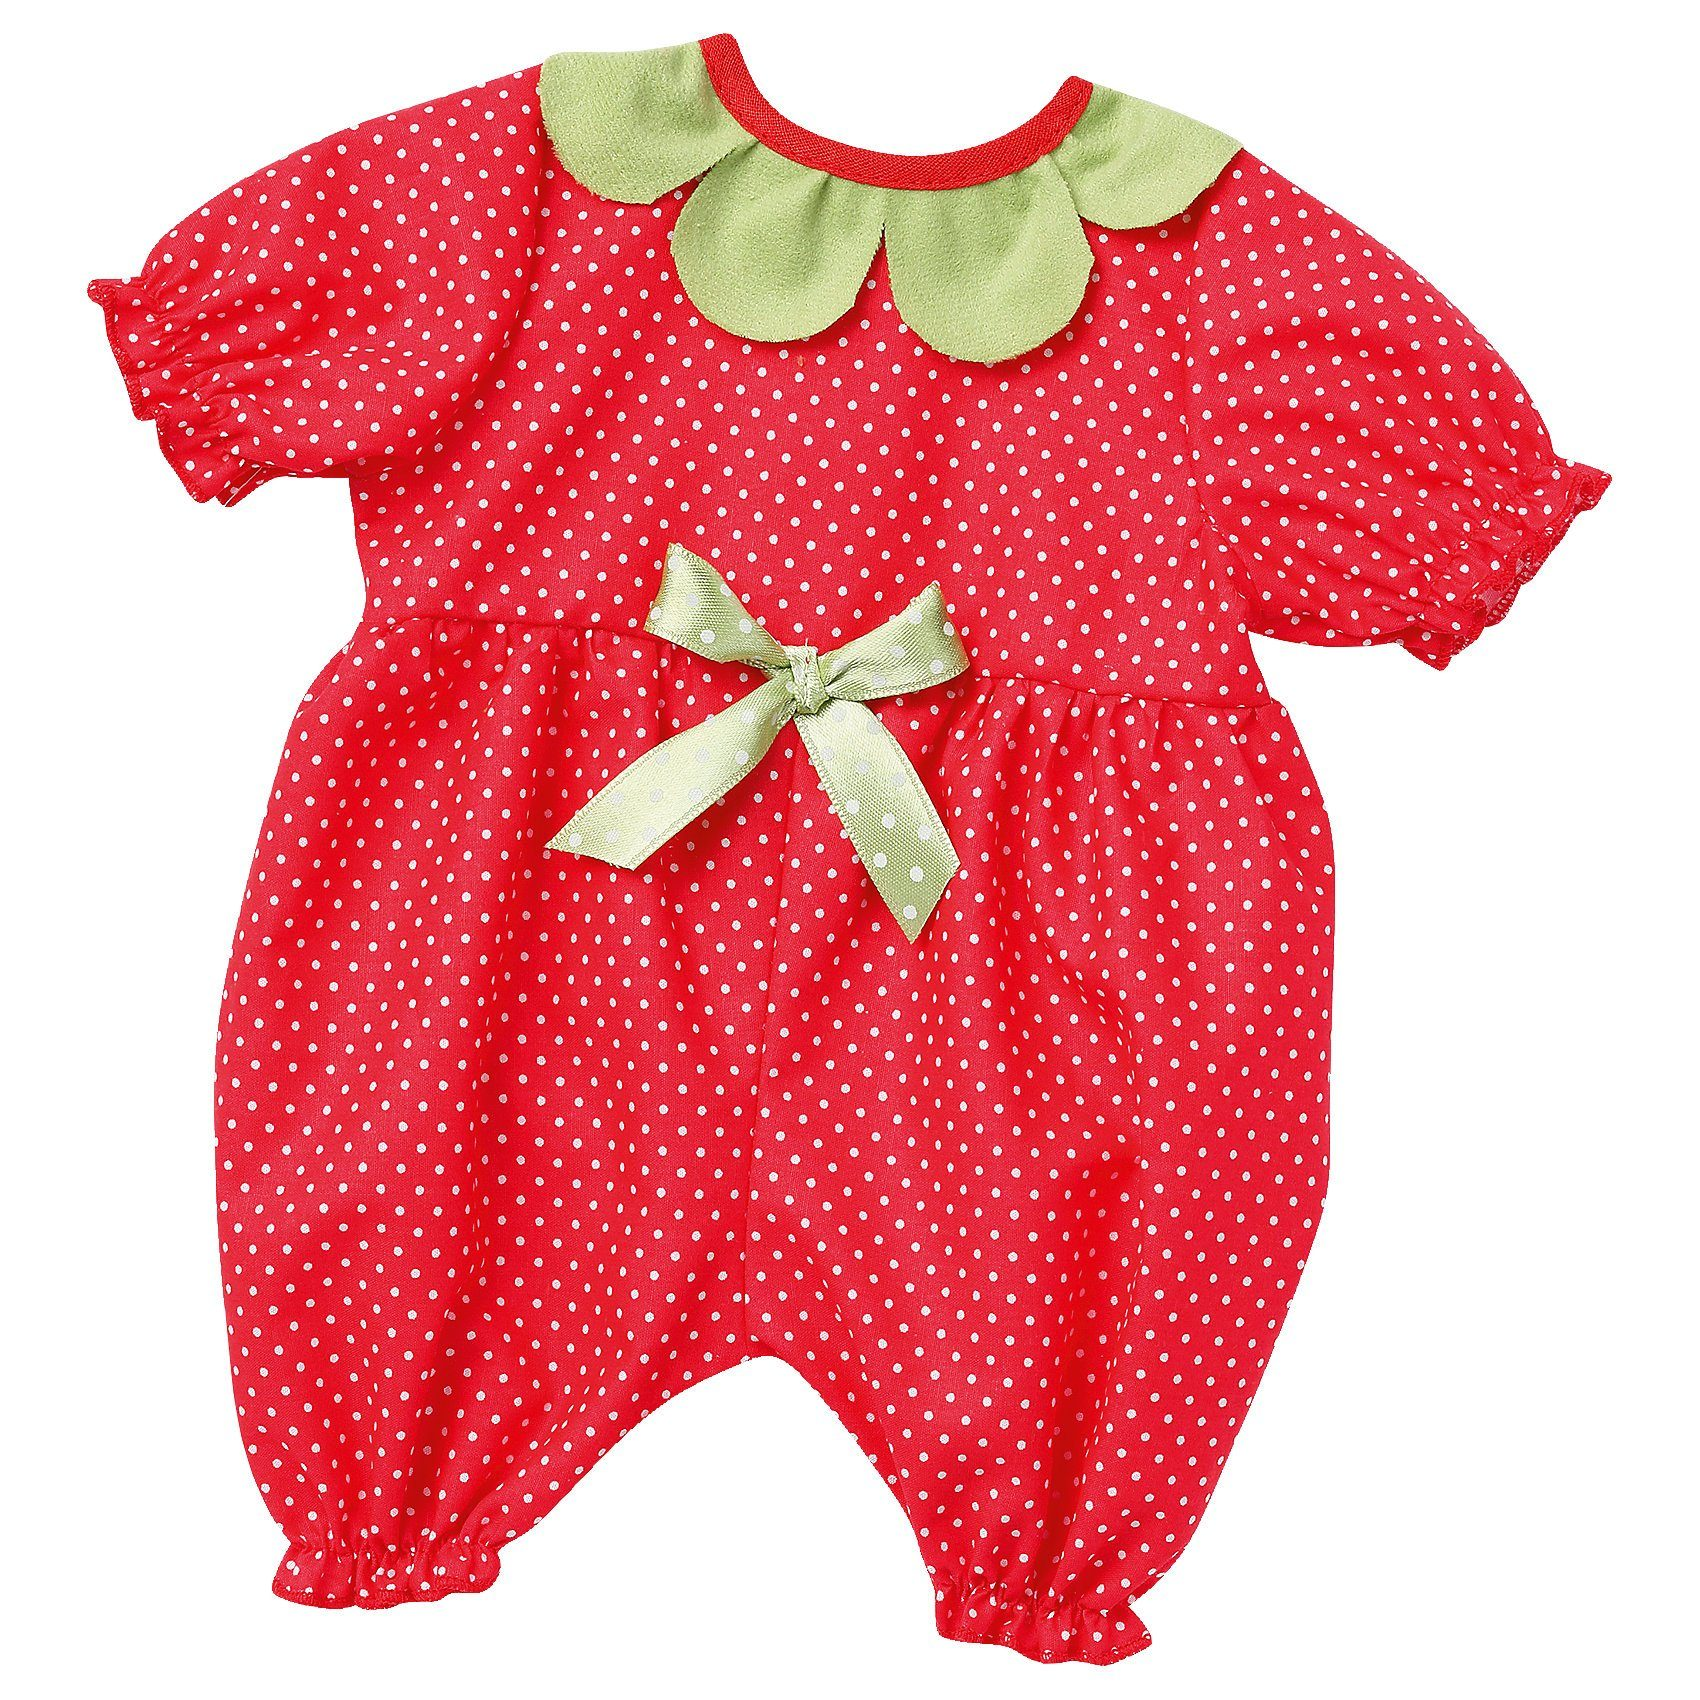 Emil Schwenk Puppenkleidung Baby-Anzug Erdbeere, Gr. 43